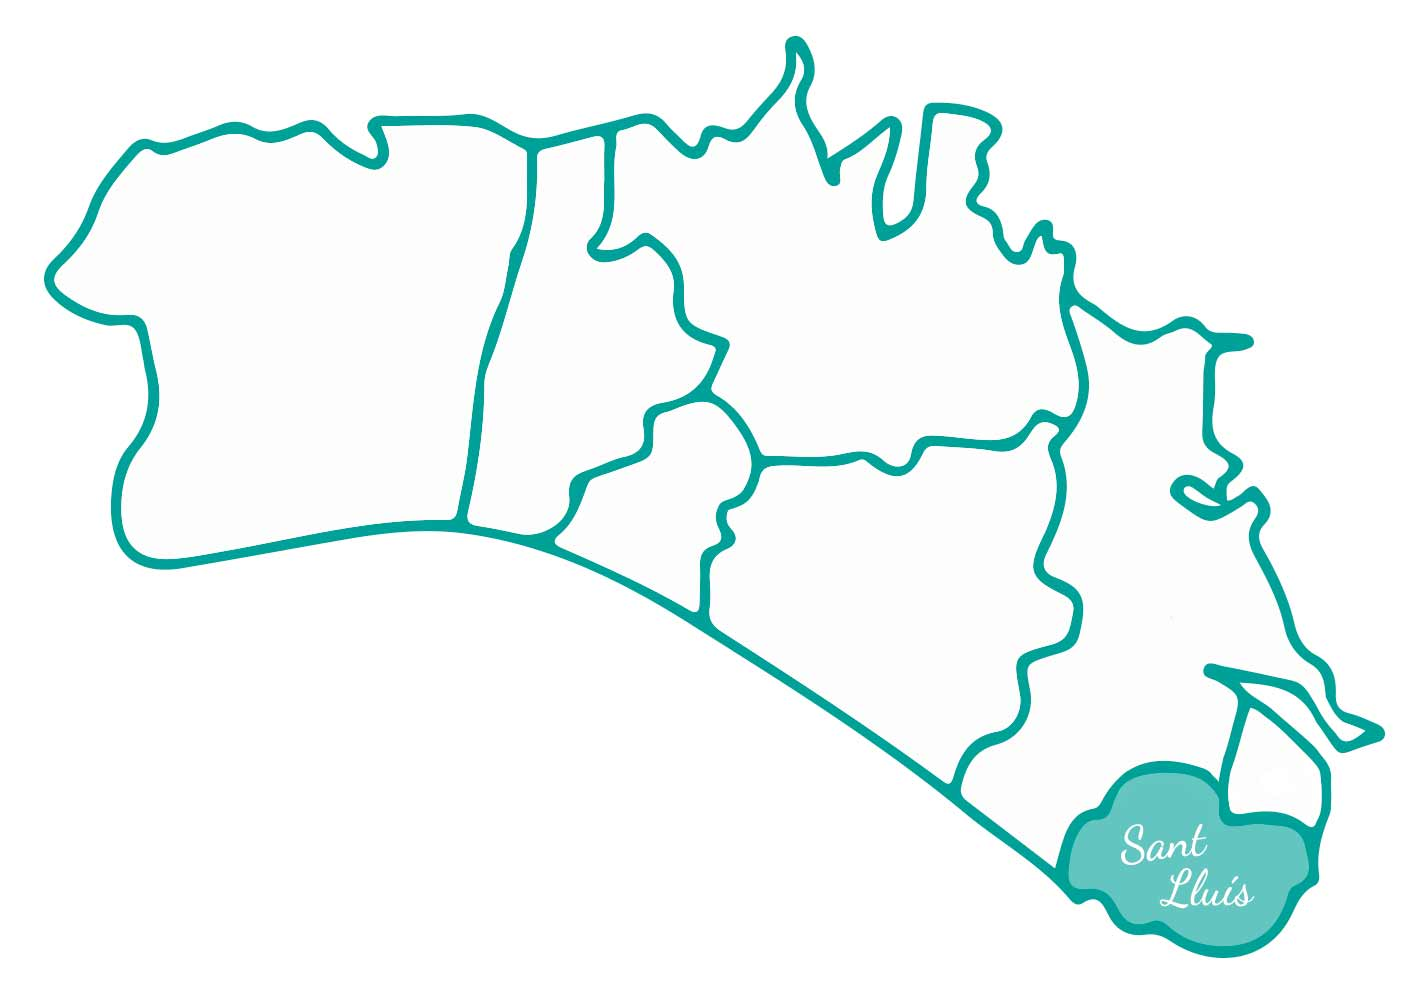 ImmoStyle Menorca Sant Lluis